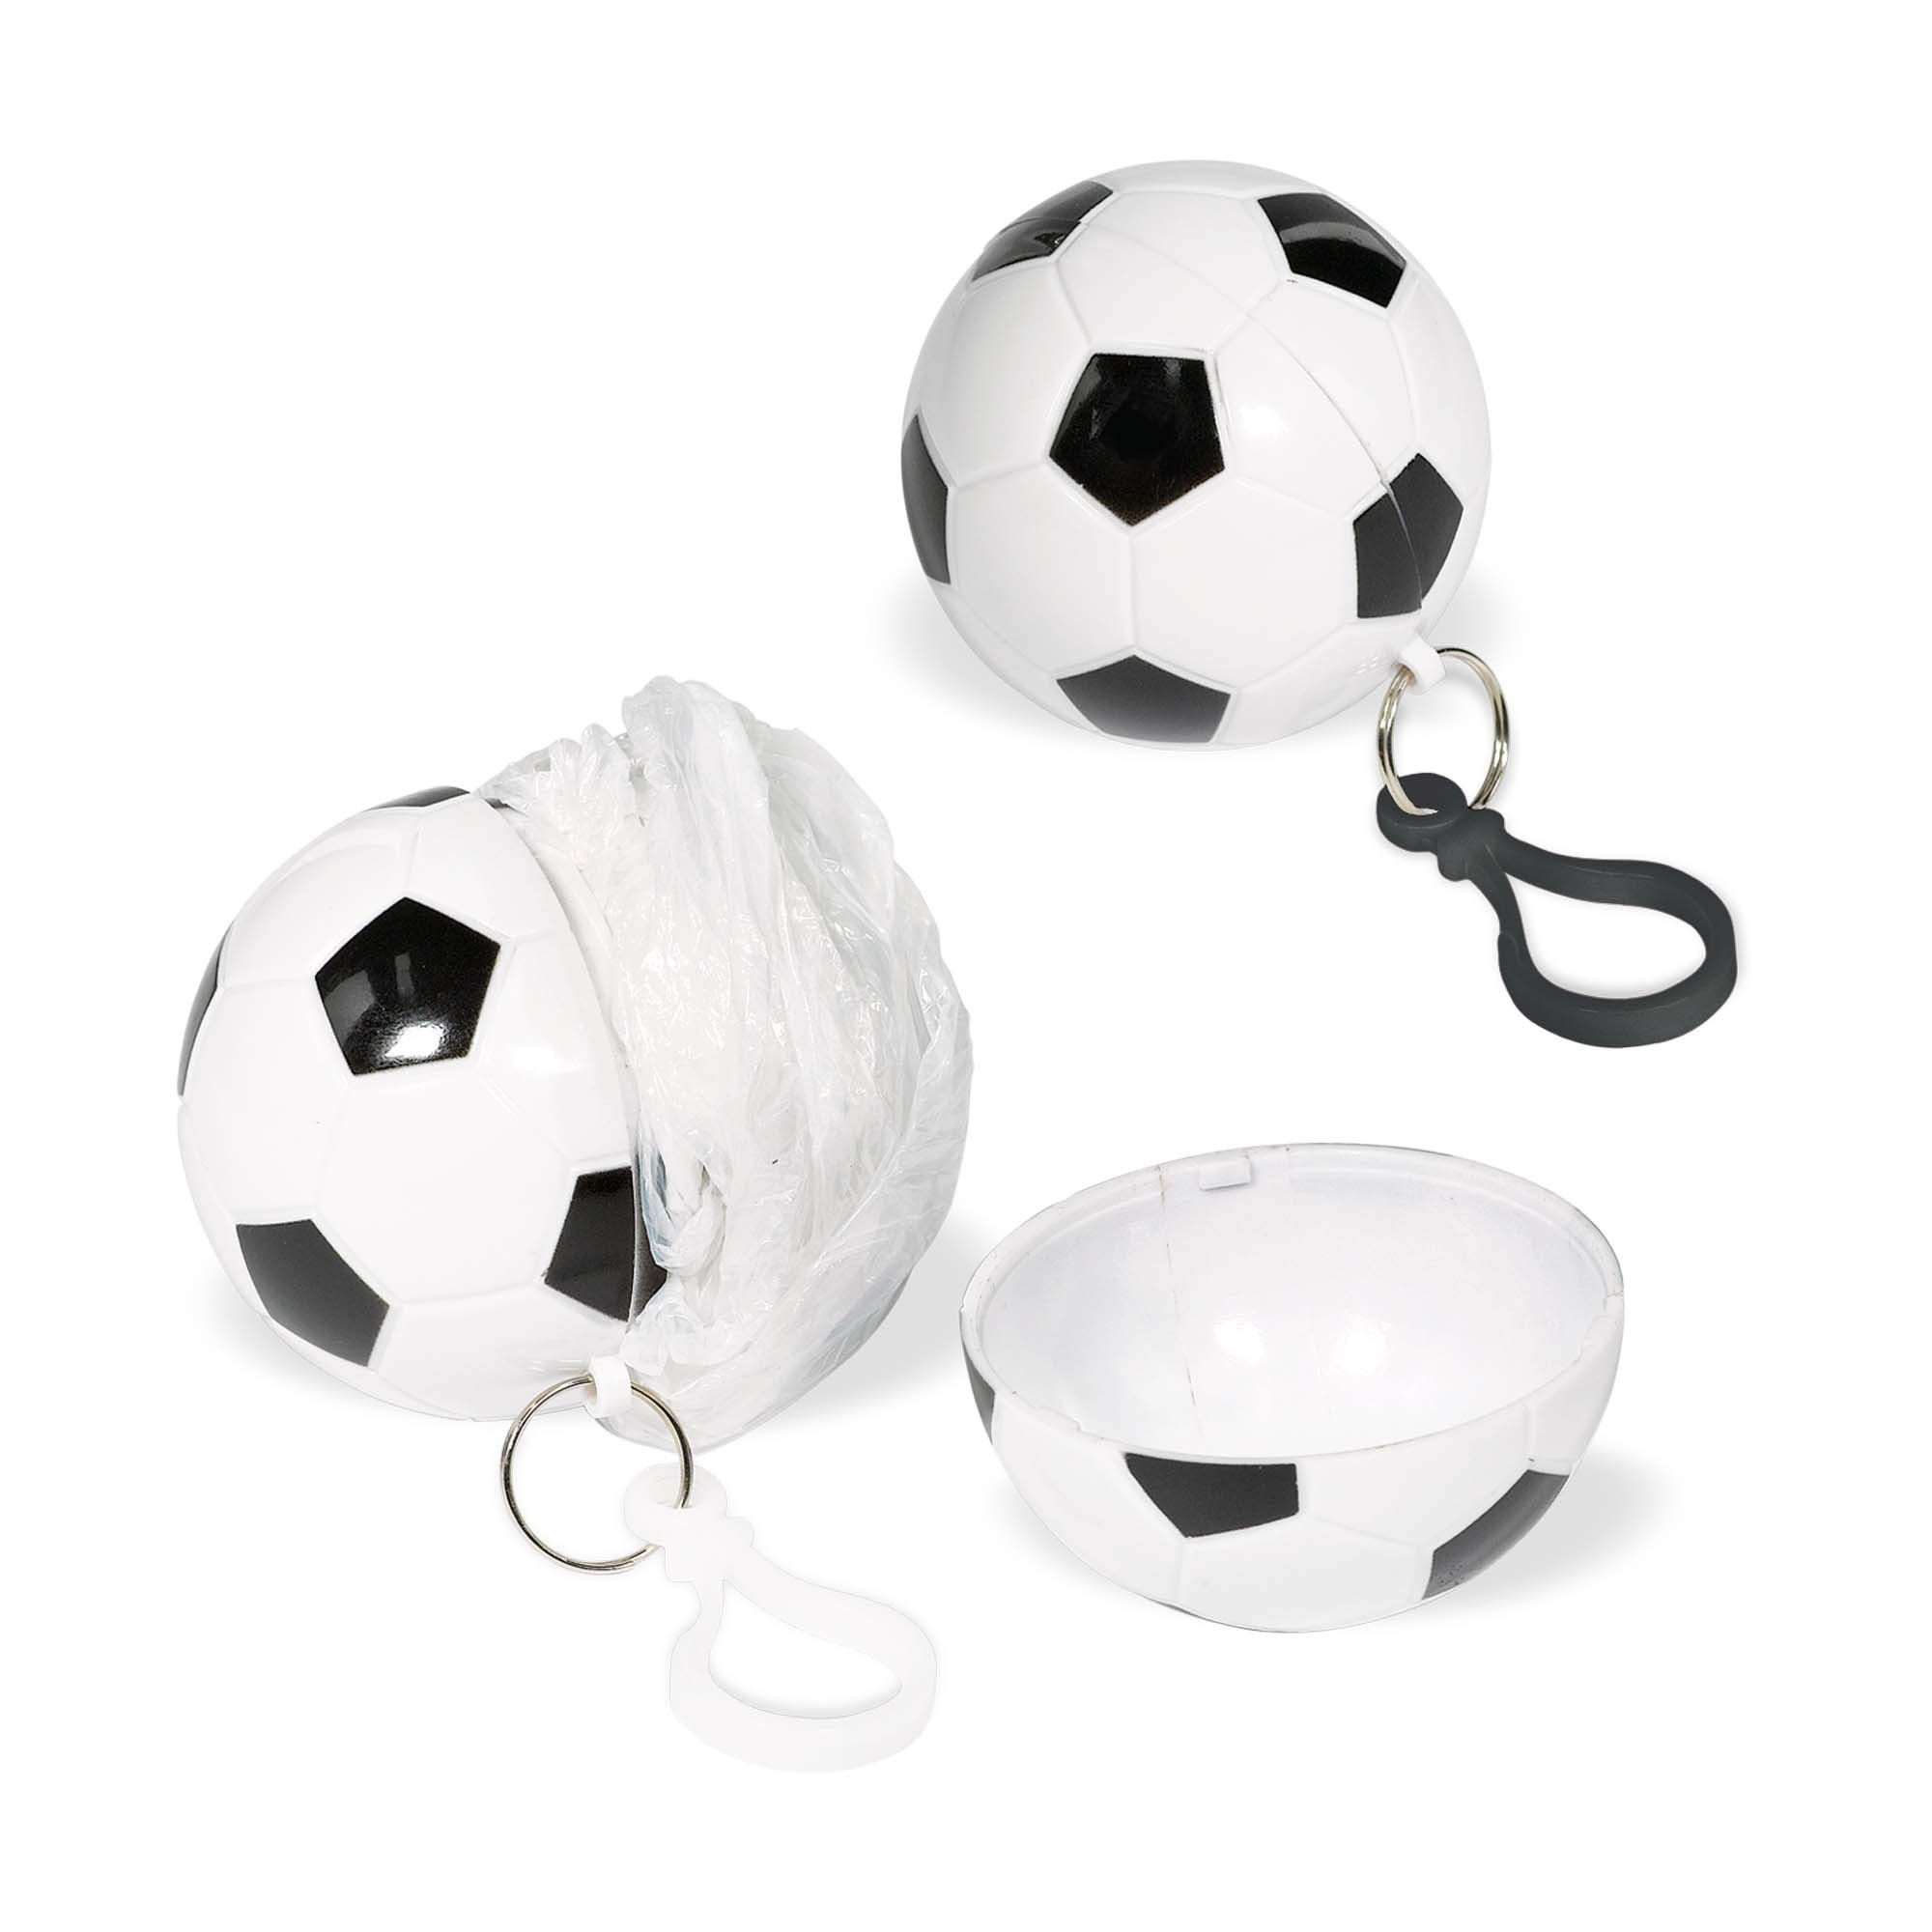 Soccer Poncho Holder